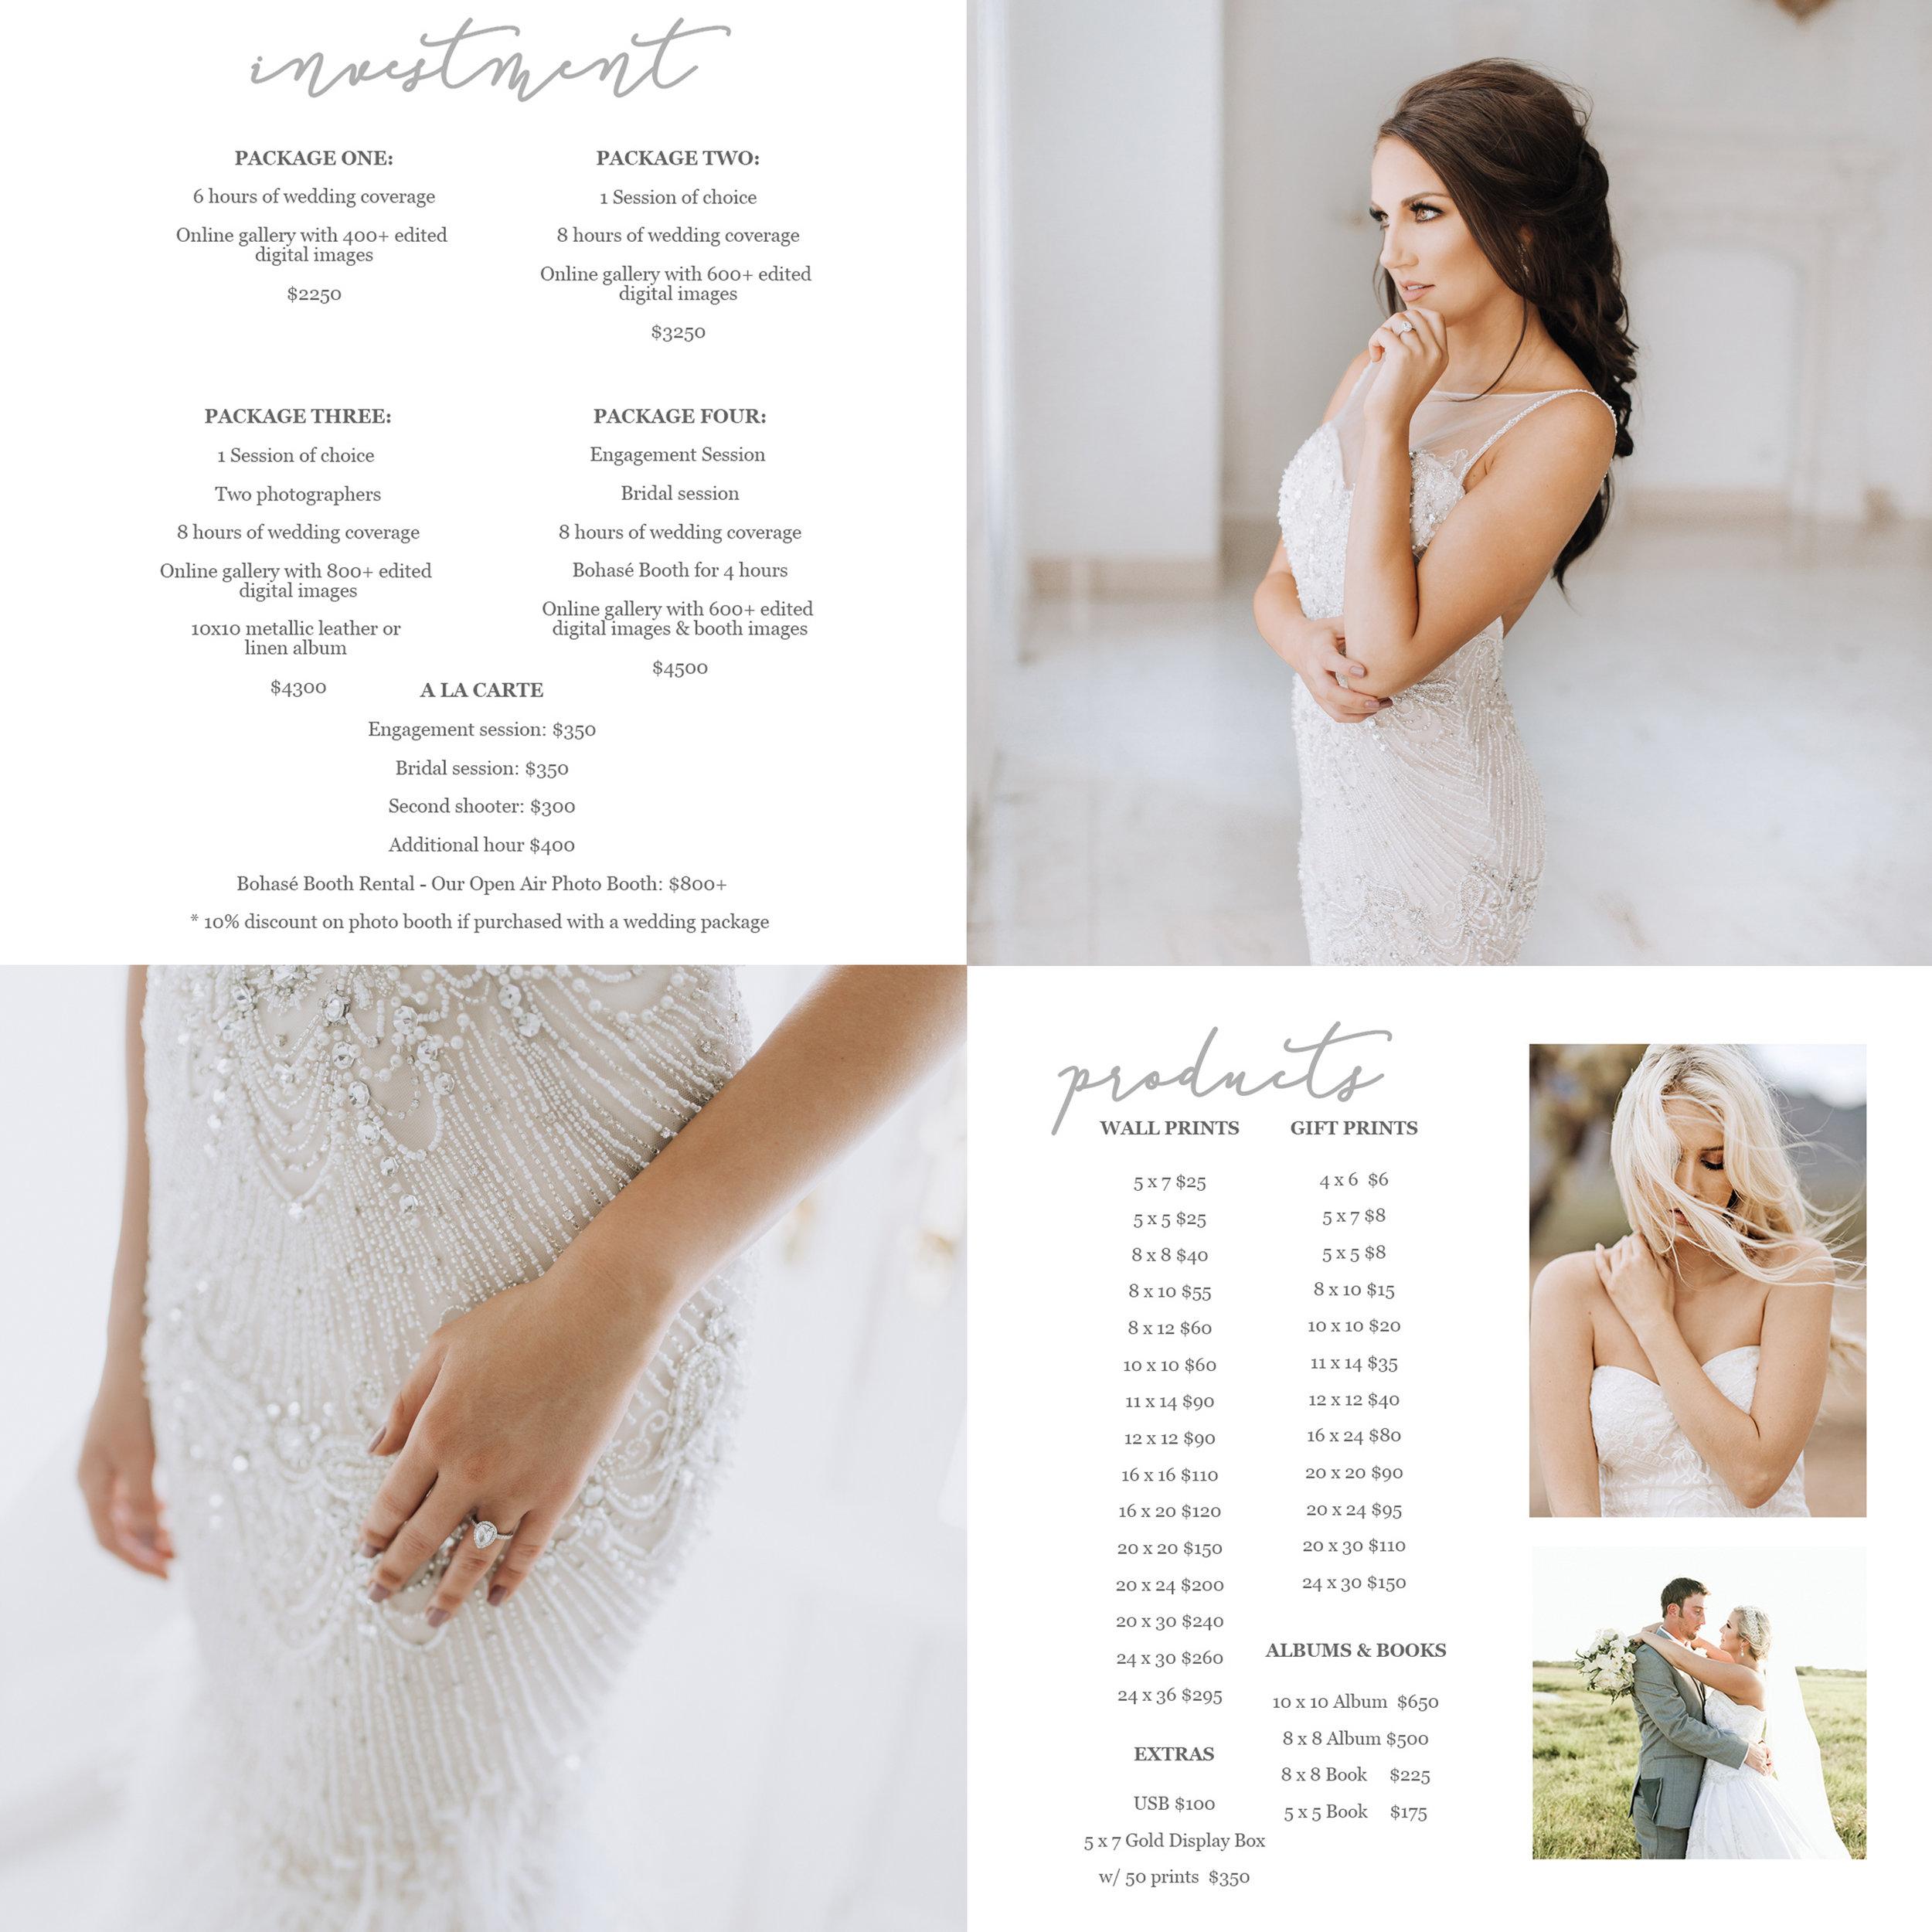 2018 wedding pricing copy.jpg